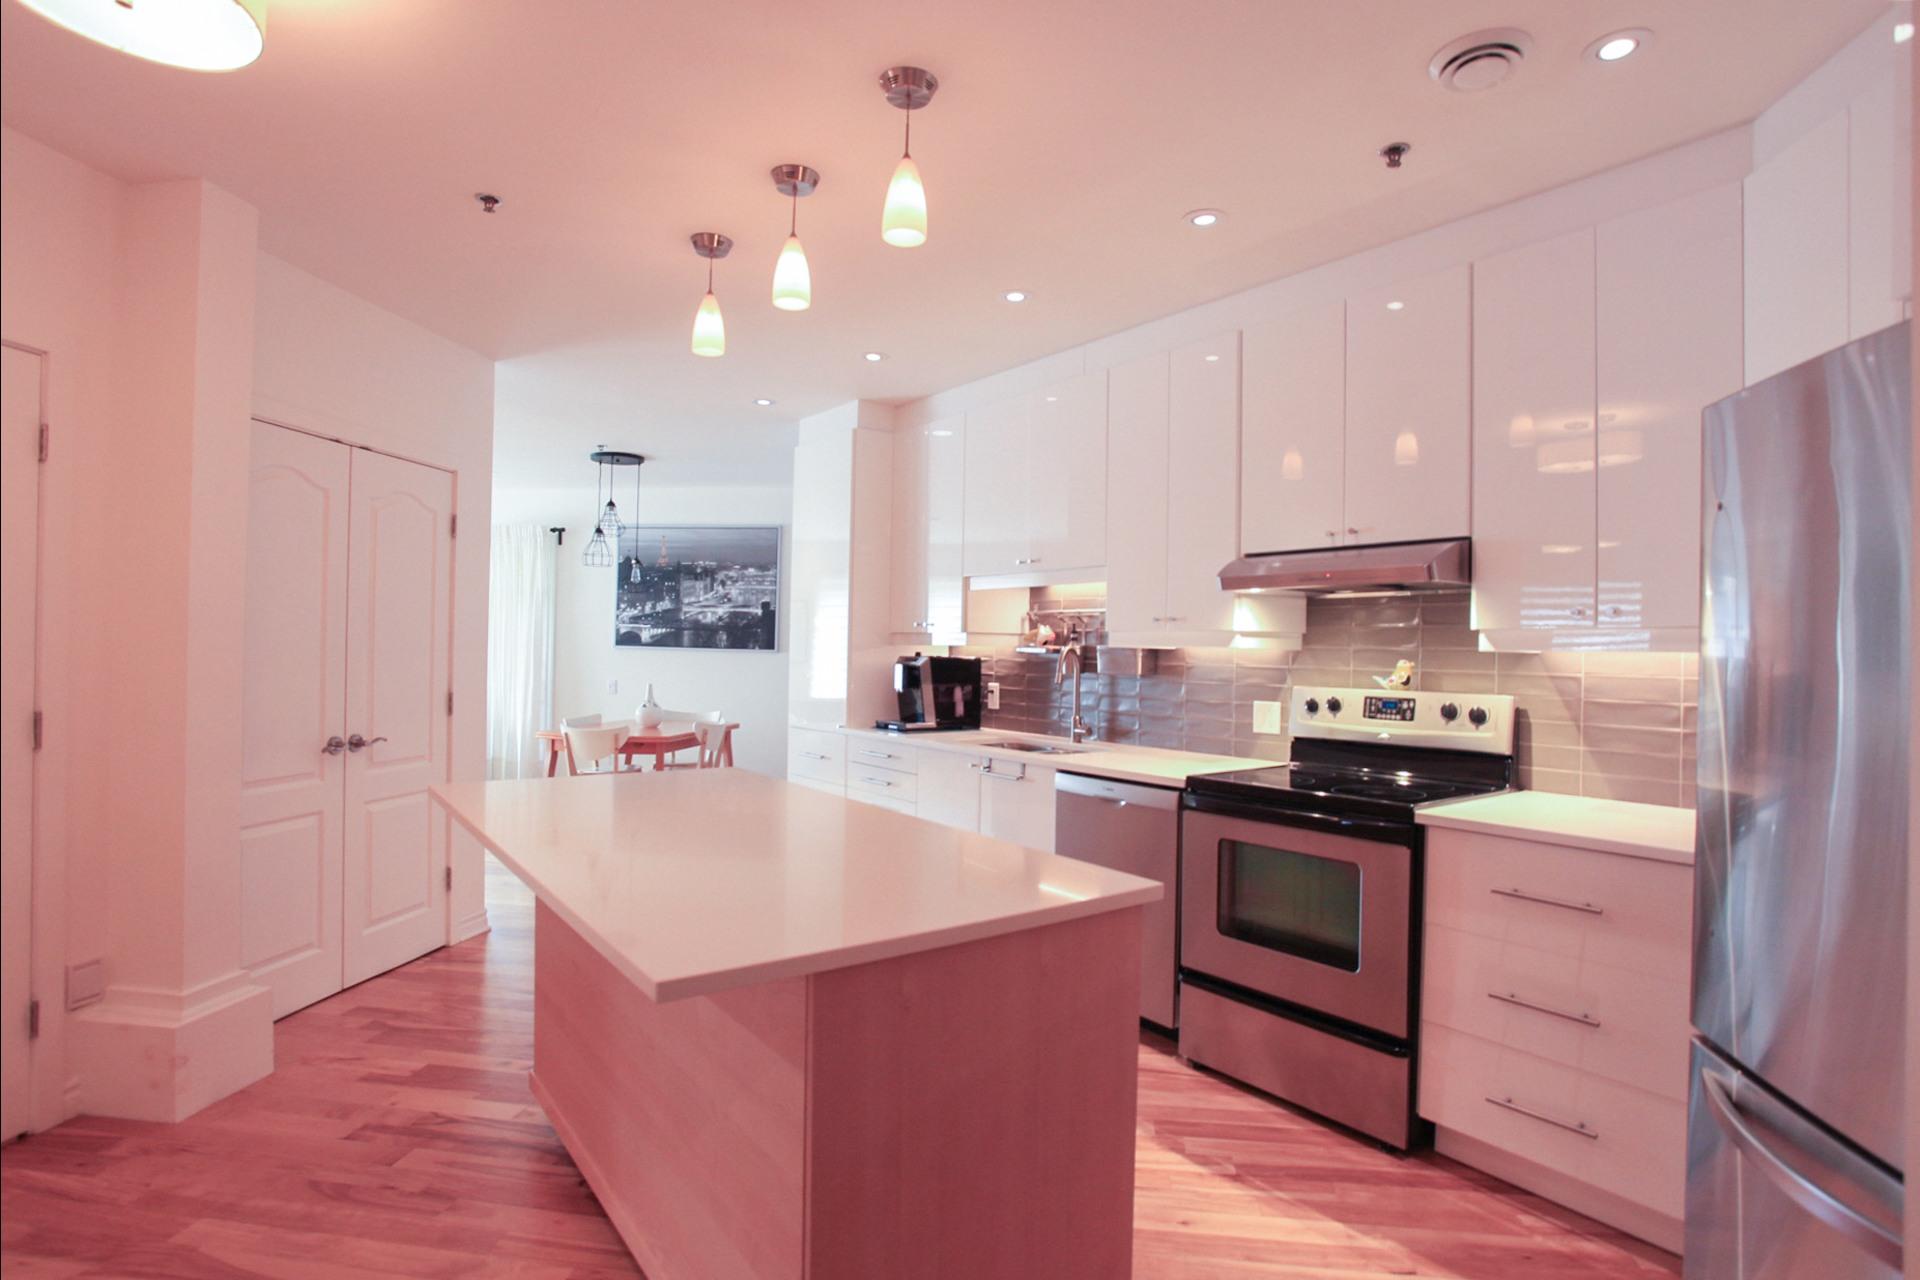 image 9 - 公寓 出租 Saint-Lambert